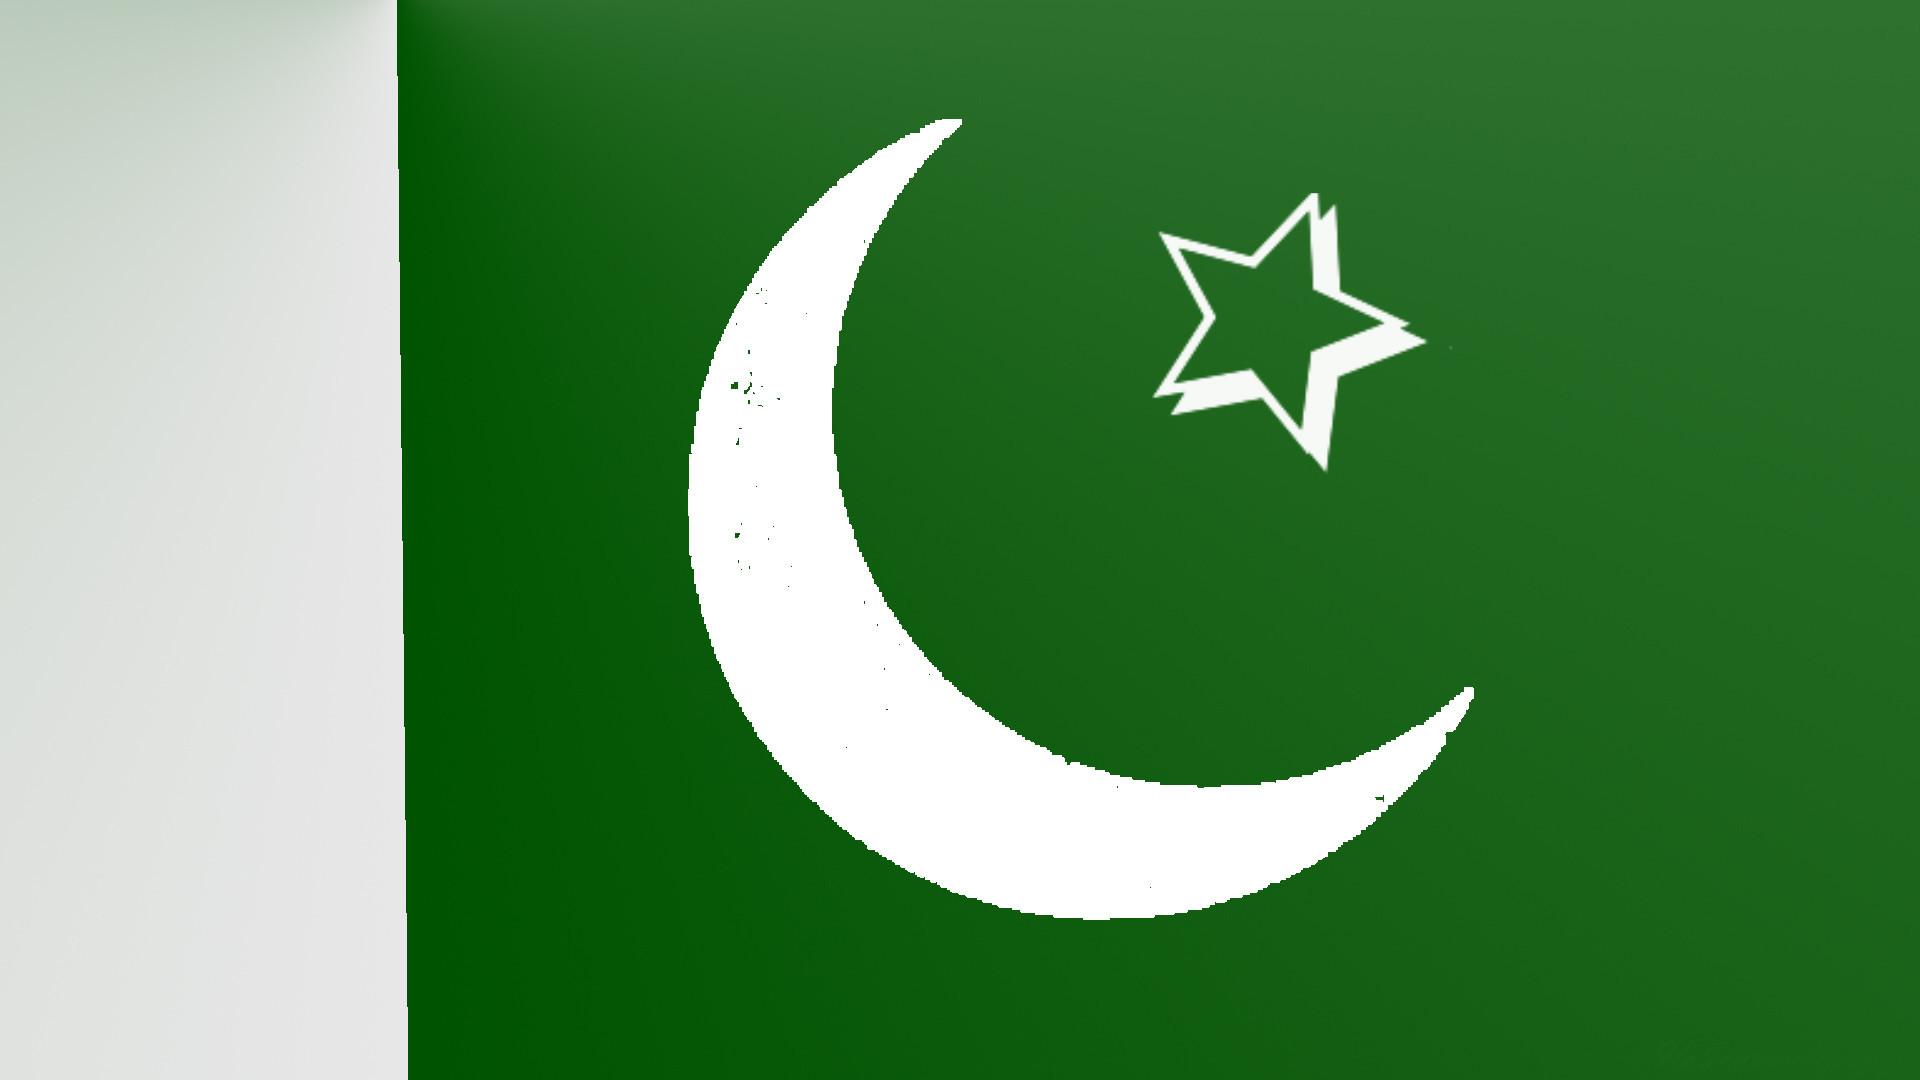 wallpaper pakistan flag 2018